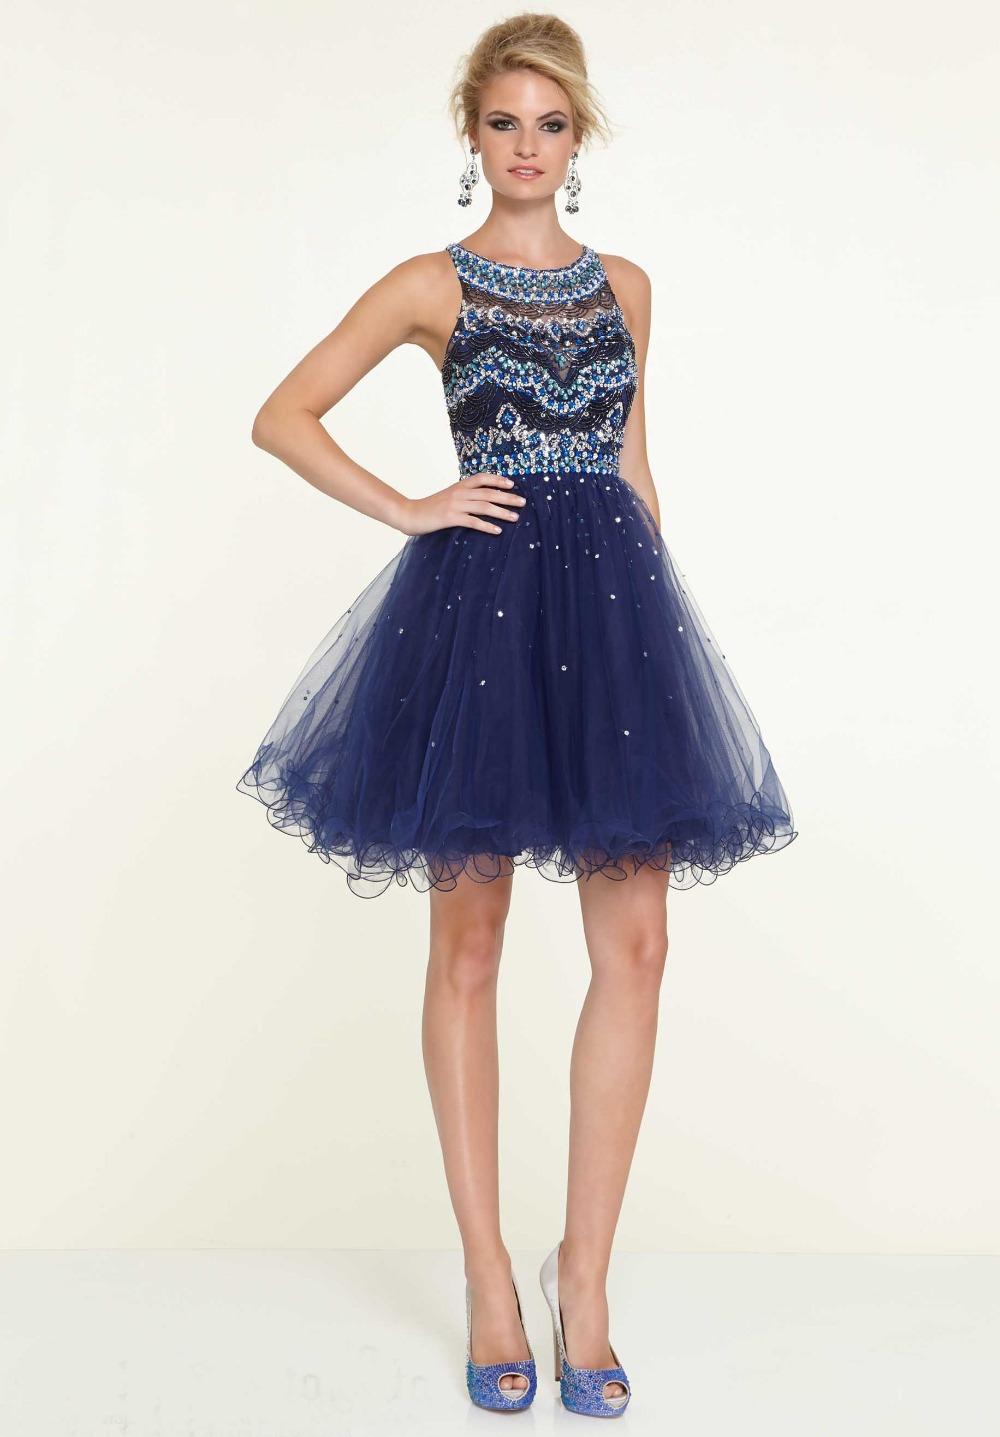 Prom Dresses In Alabama 57